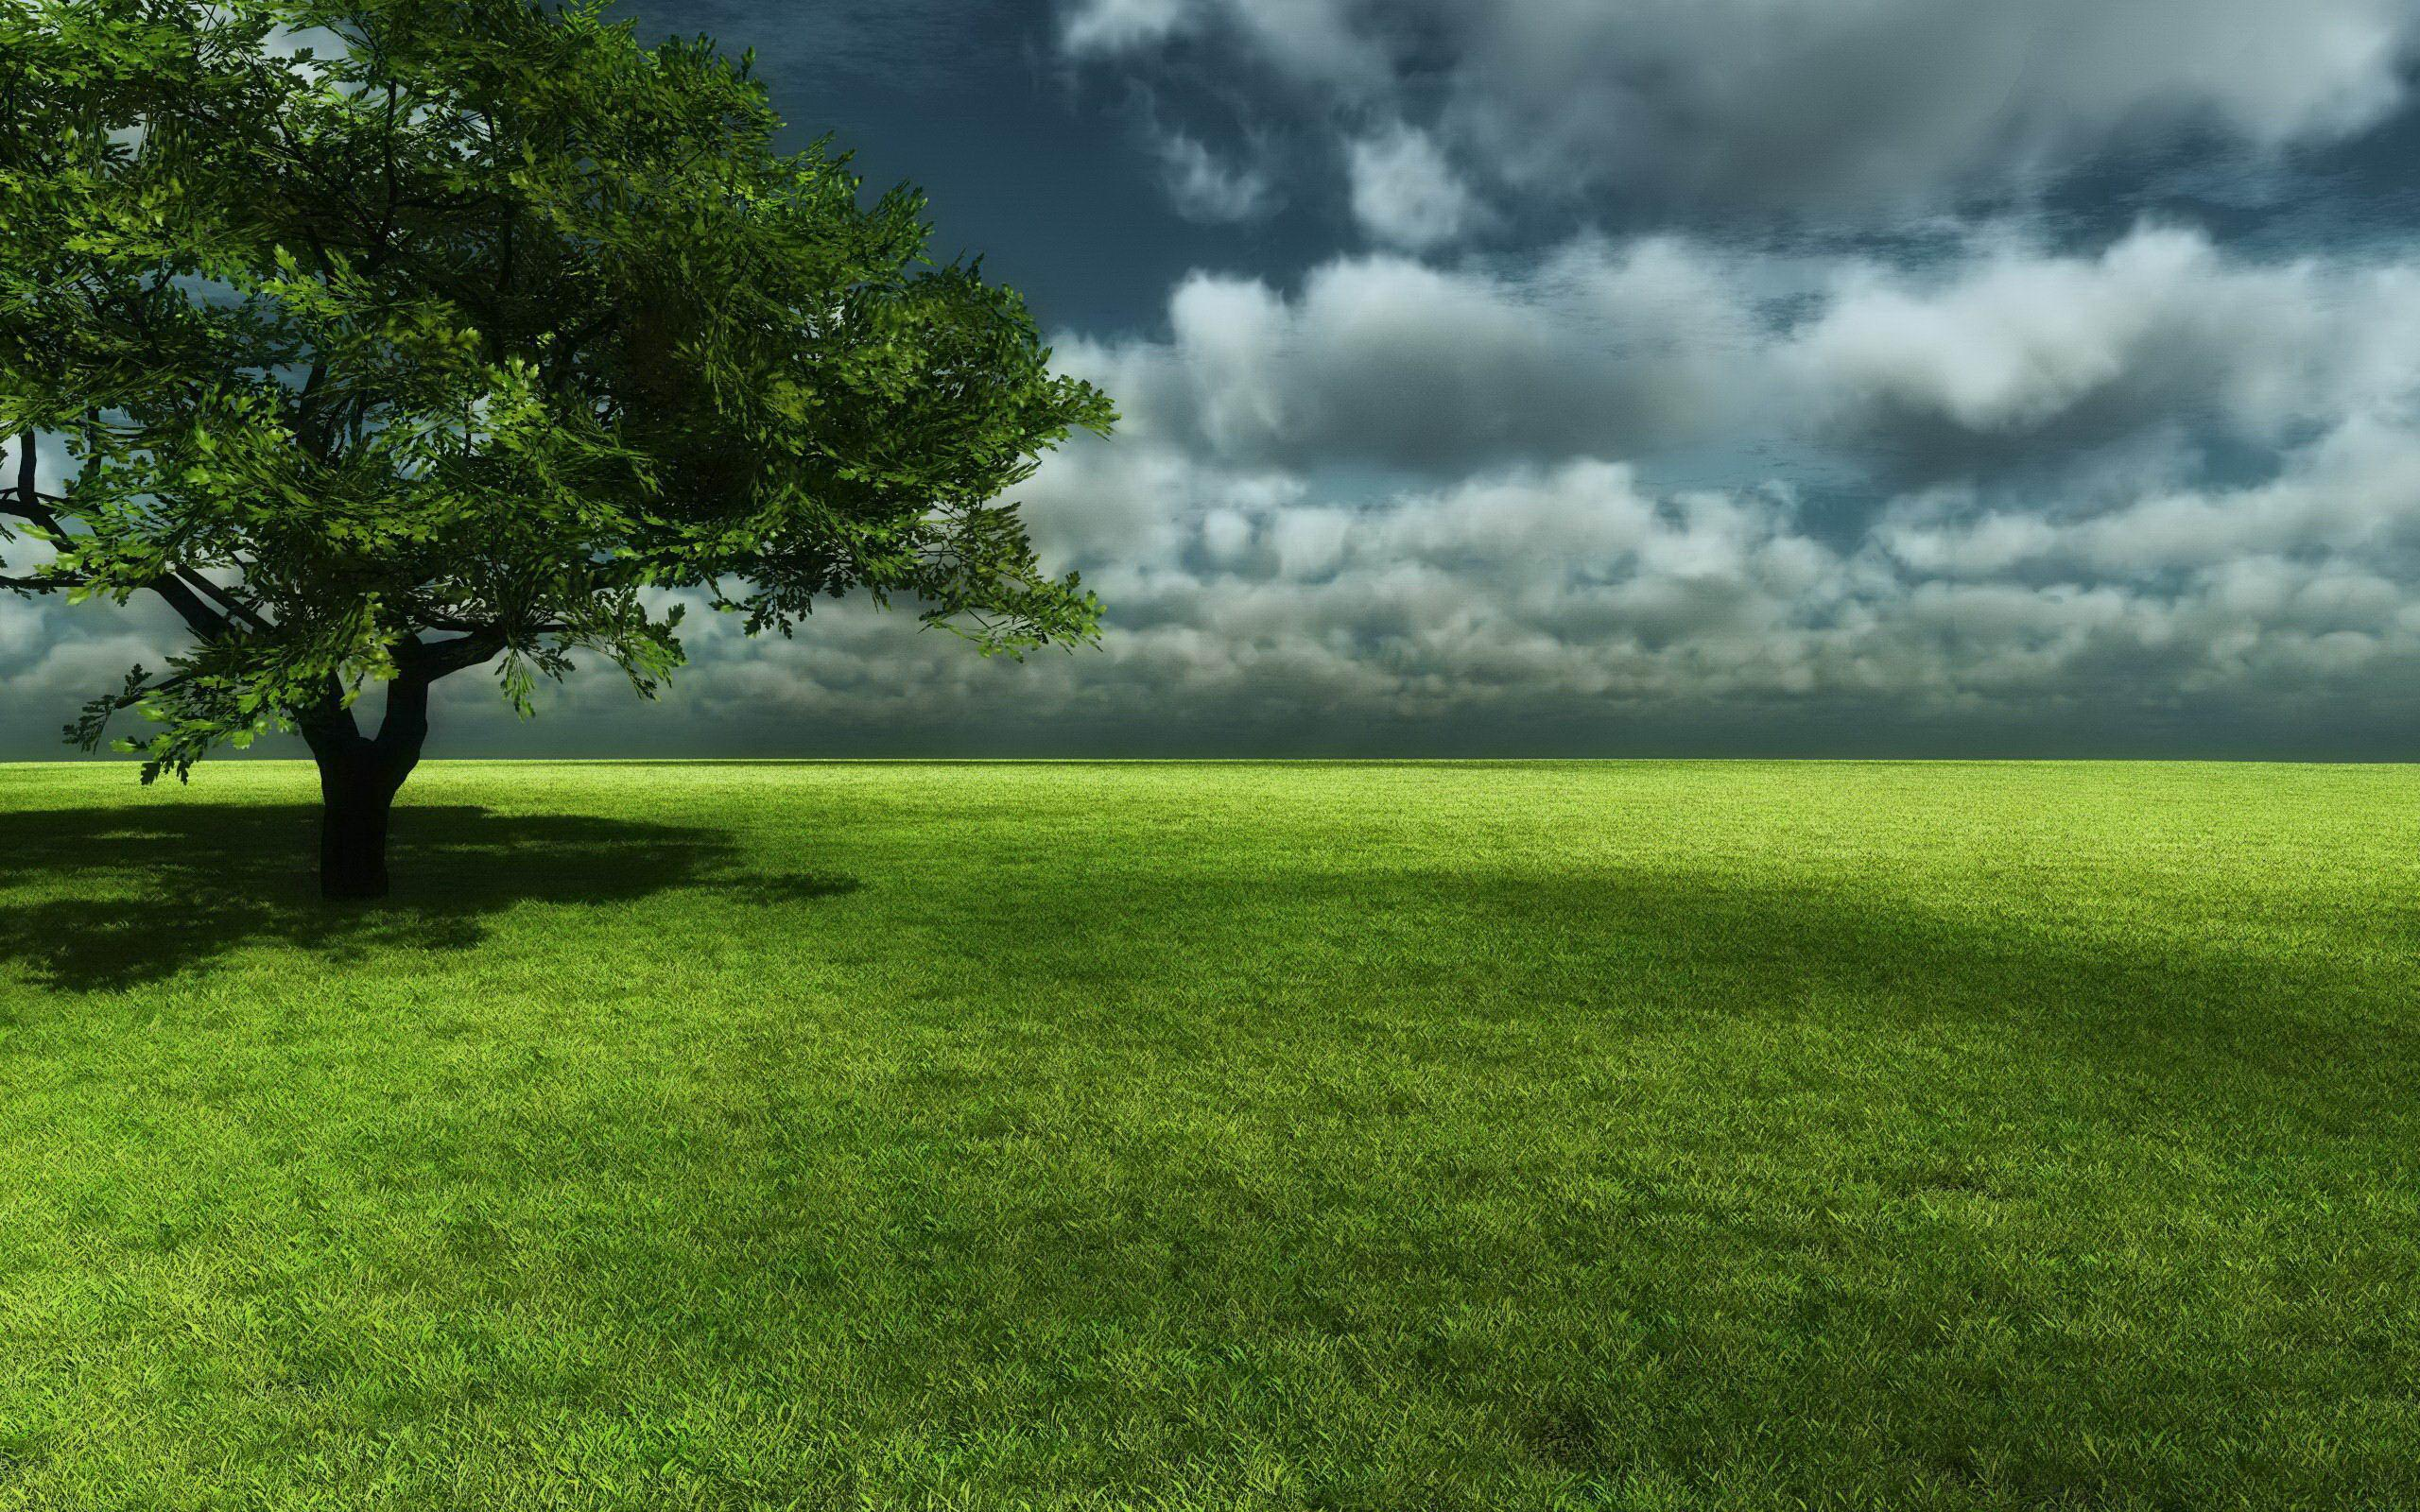 Grass Landscape Background 18871 1920x1200 px